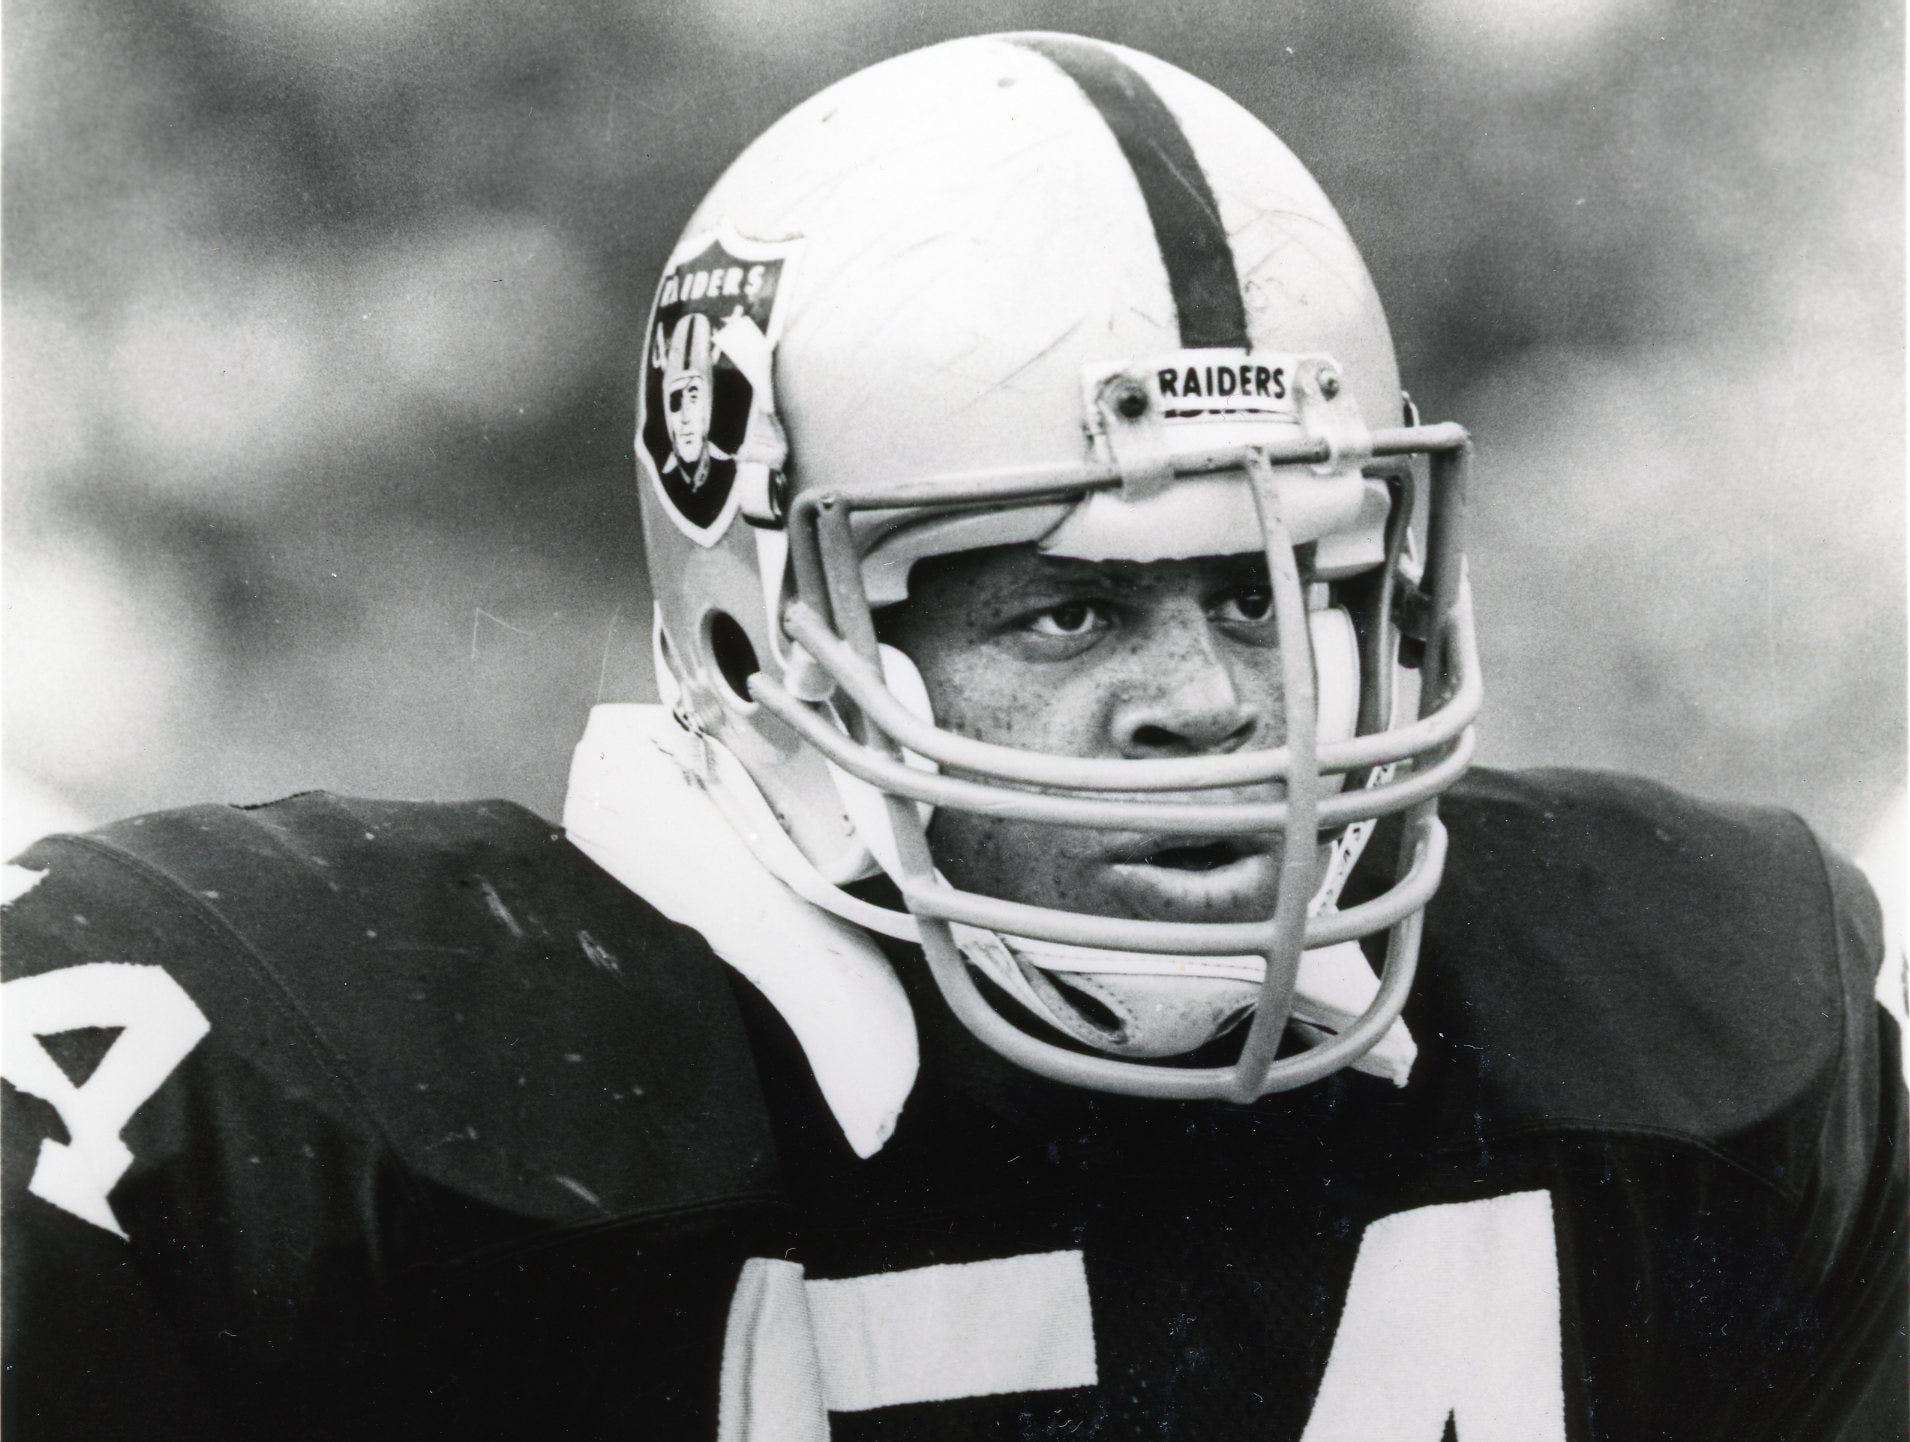 Reggie McKenzie, August, 1989 with the Los Angeles Raiders.